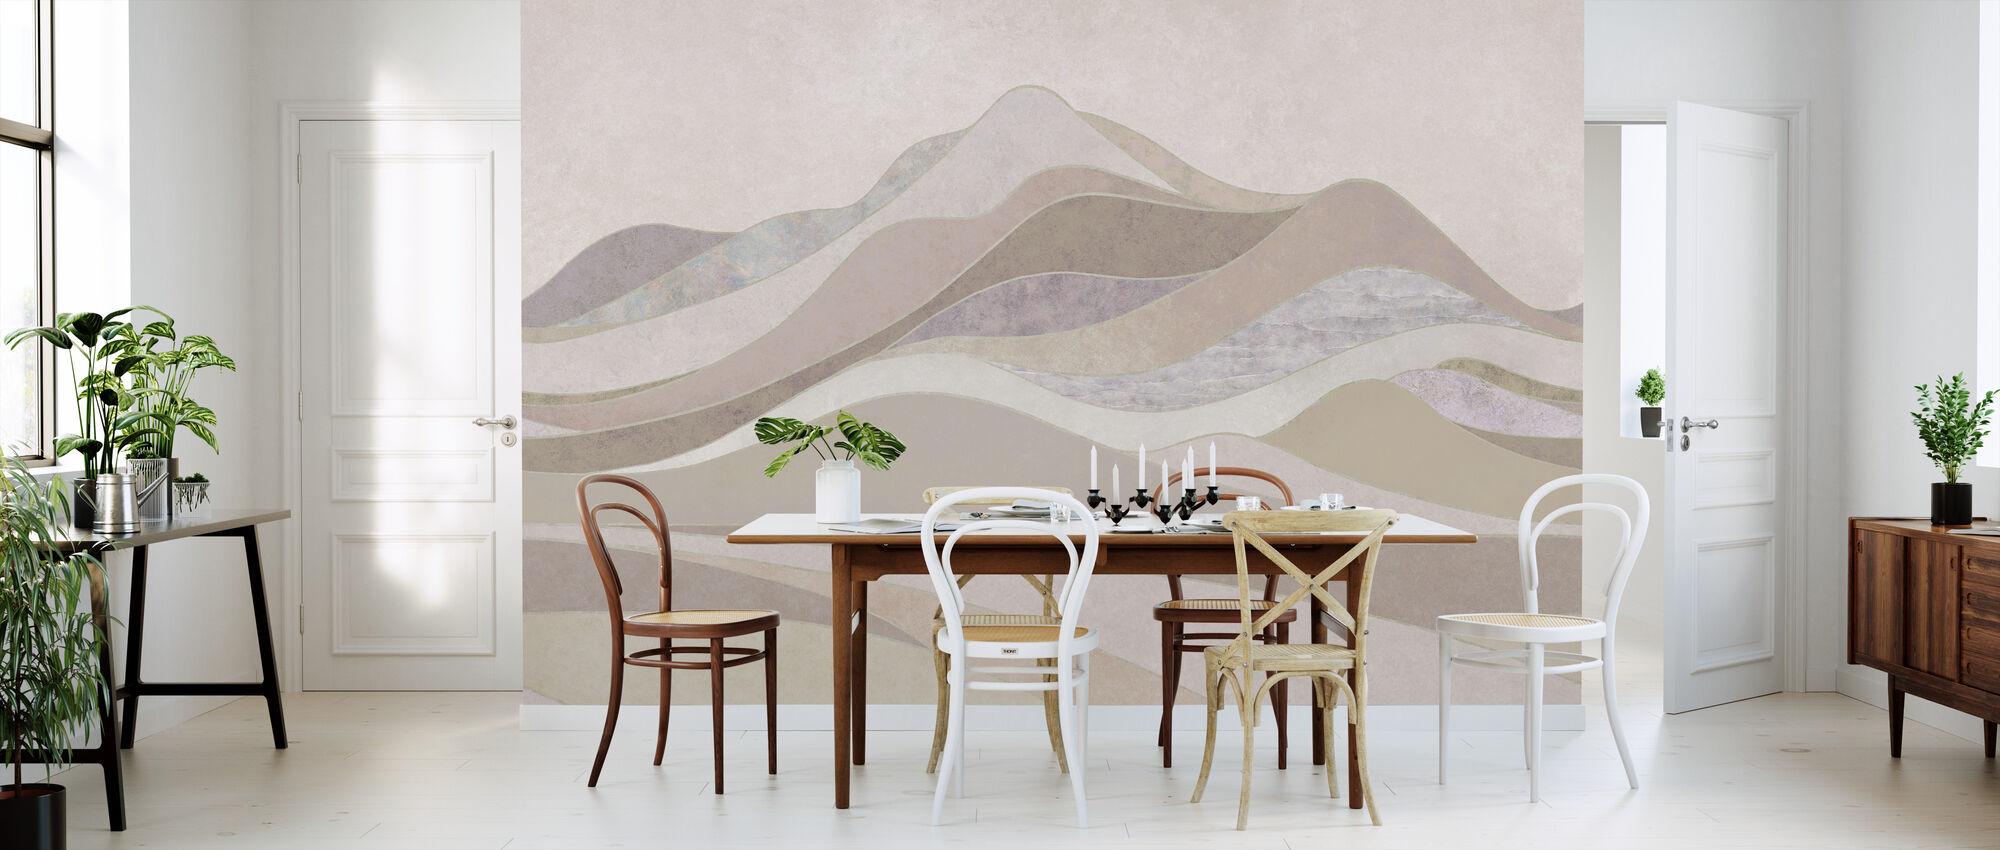 Concord Landscape - Sand - Wallpaper - Kitchen